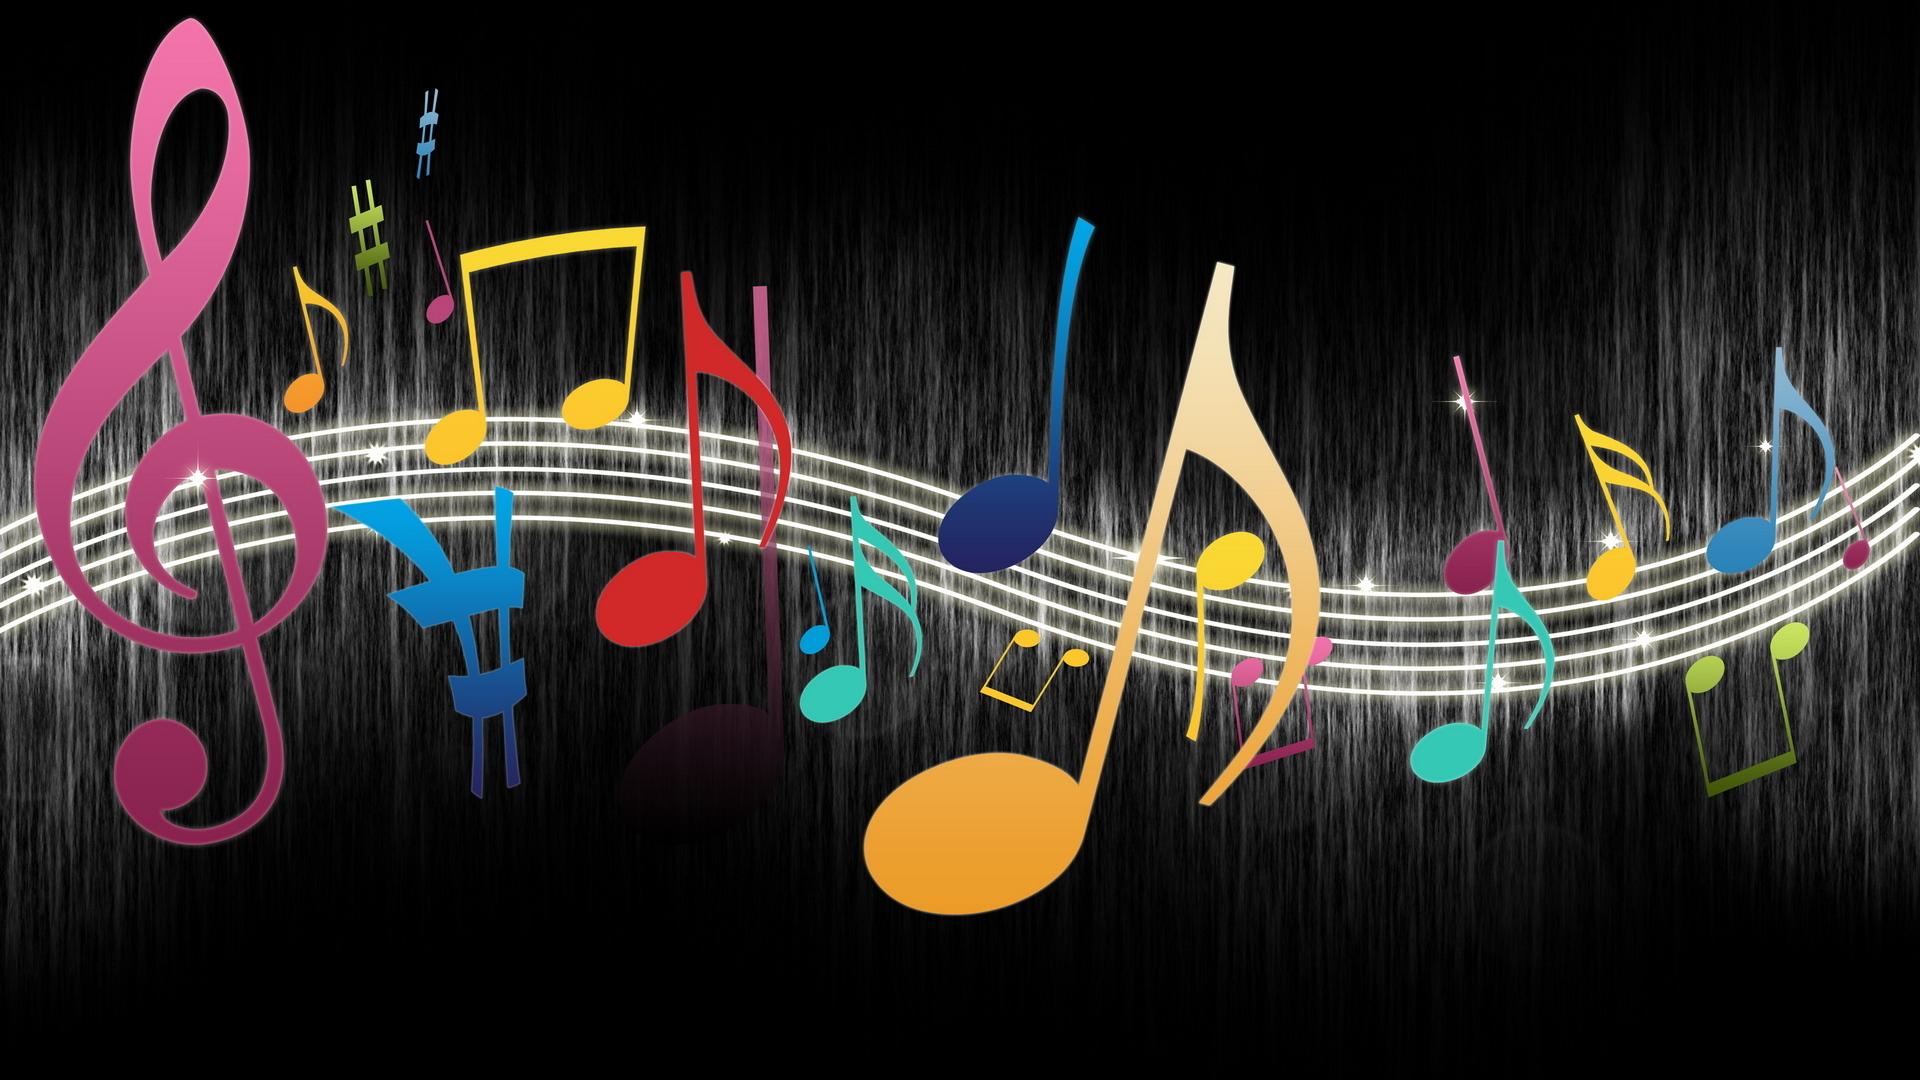 music hd wallpaper | background image | 1920x1080 | id:218994